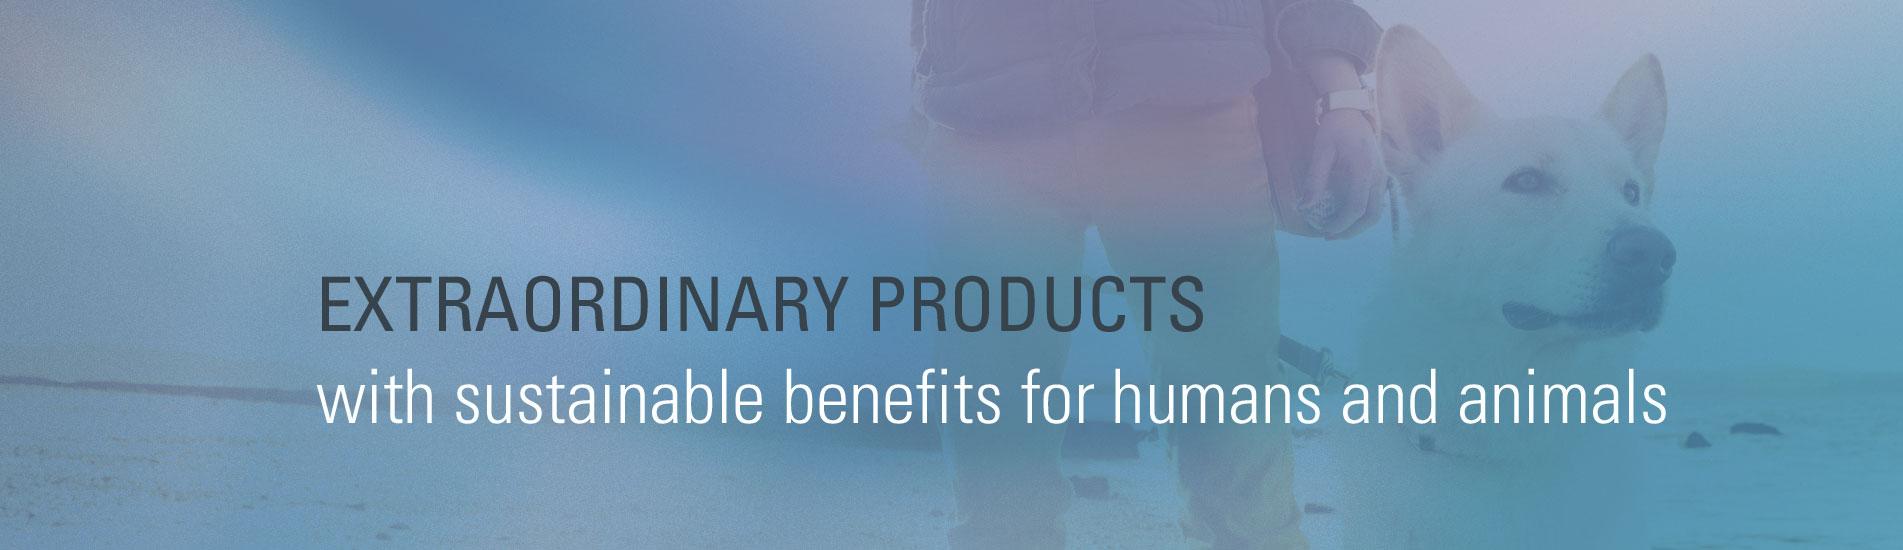 tiwegu - extraordinary products